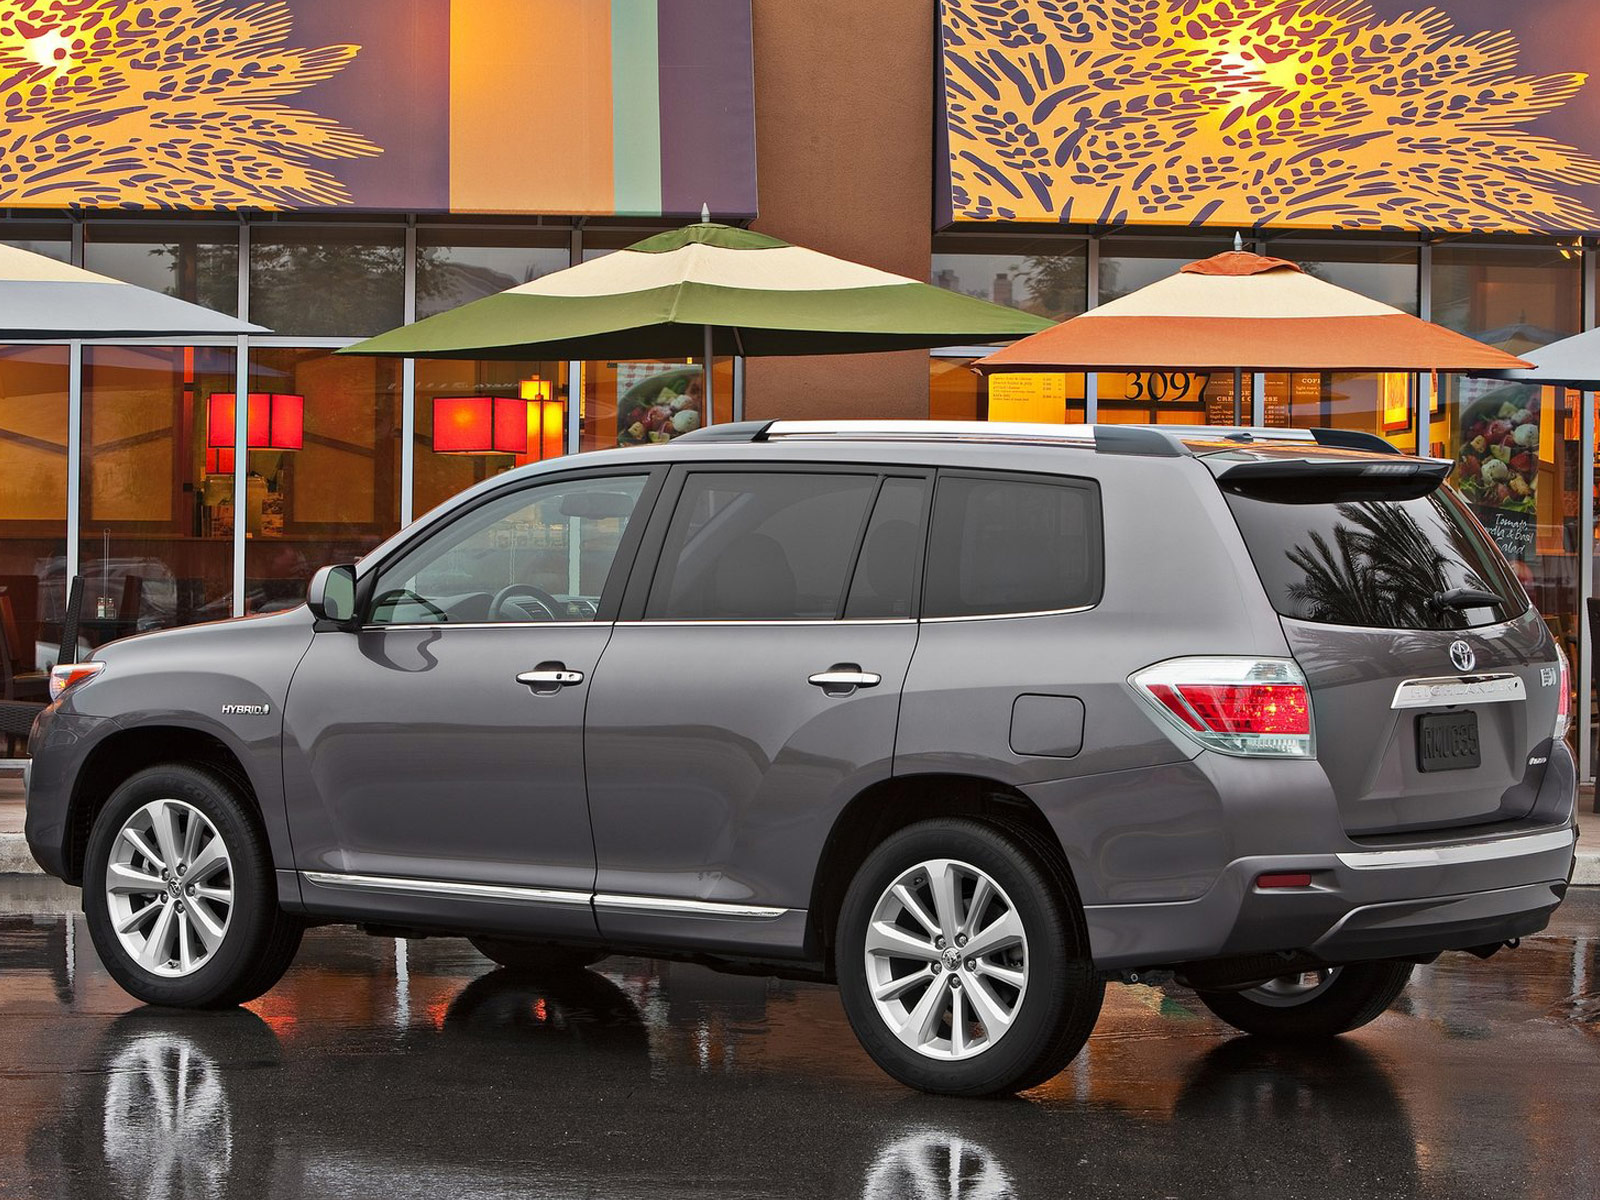 Gambar Mobil Toyota Highlander Hybrid 2011